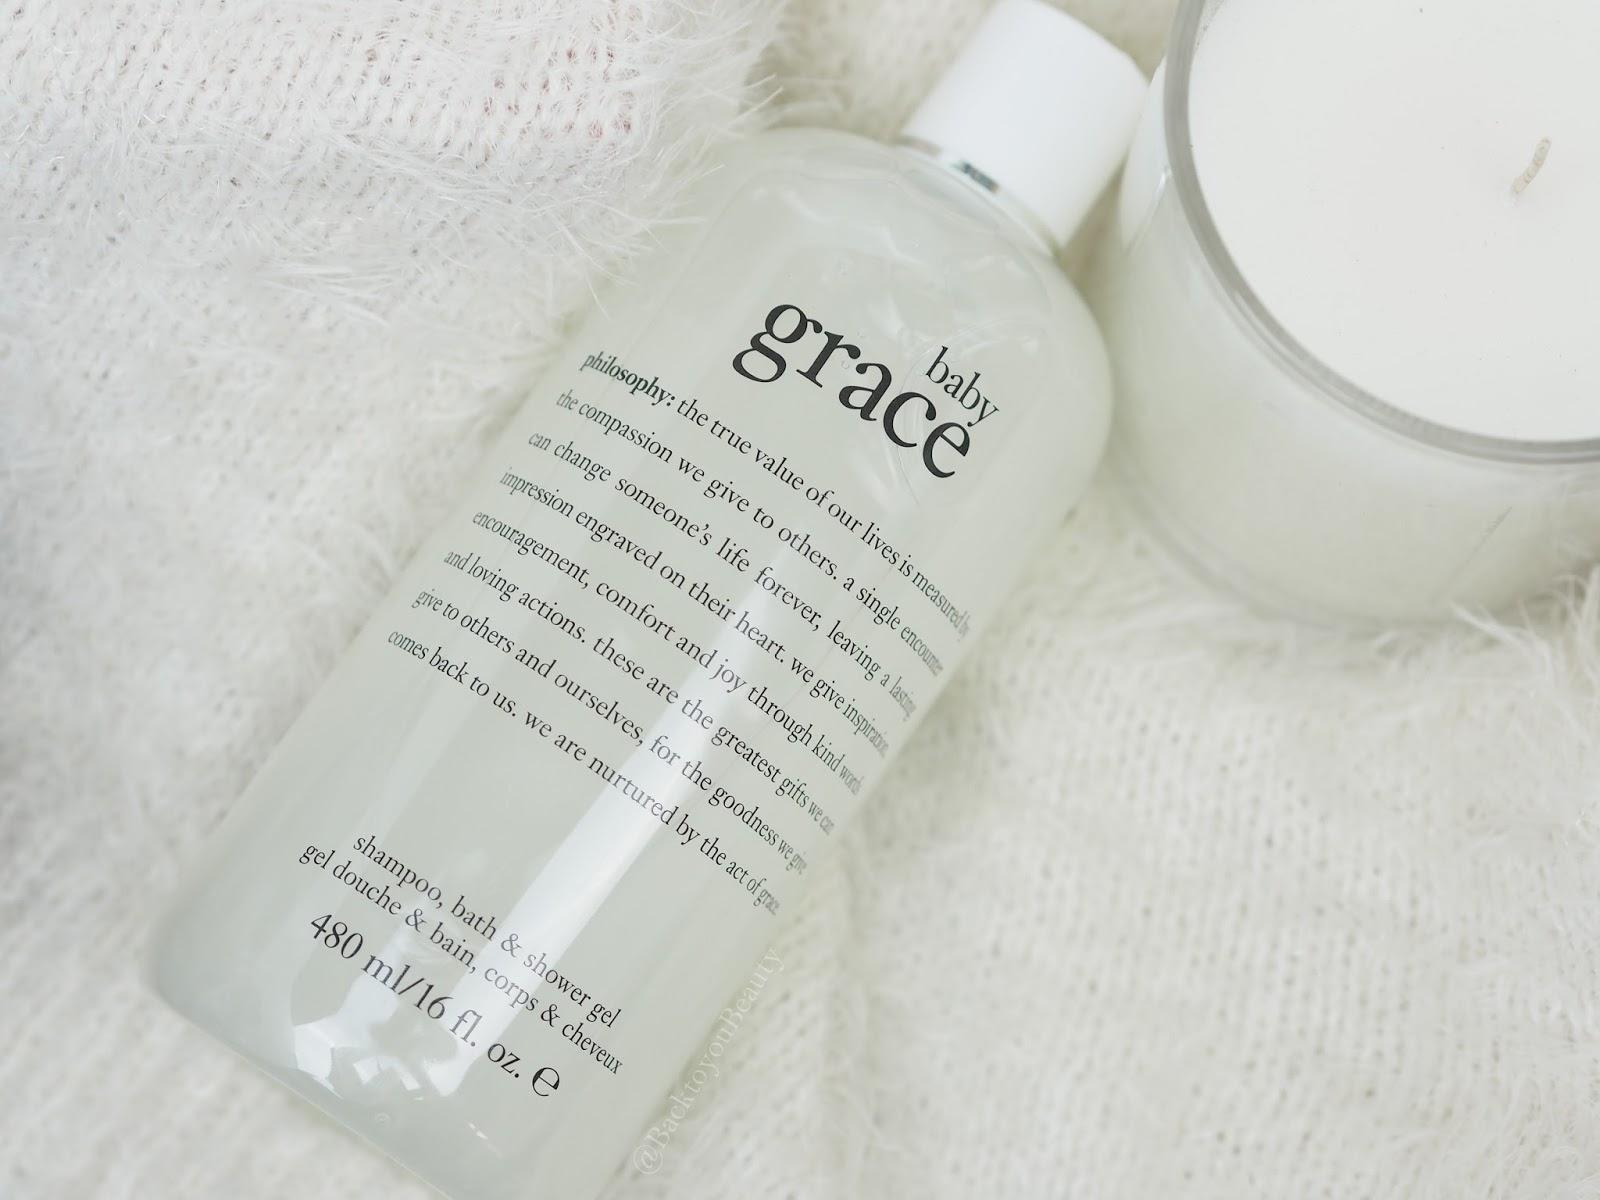 Baby Grace Shampoo, Bath & Shower Gel 480ml